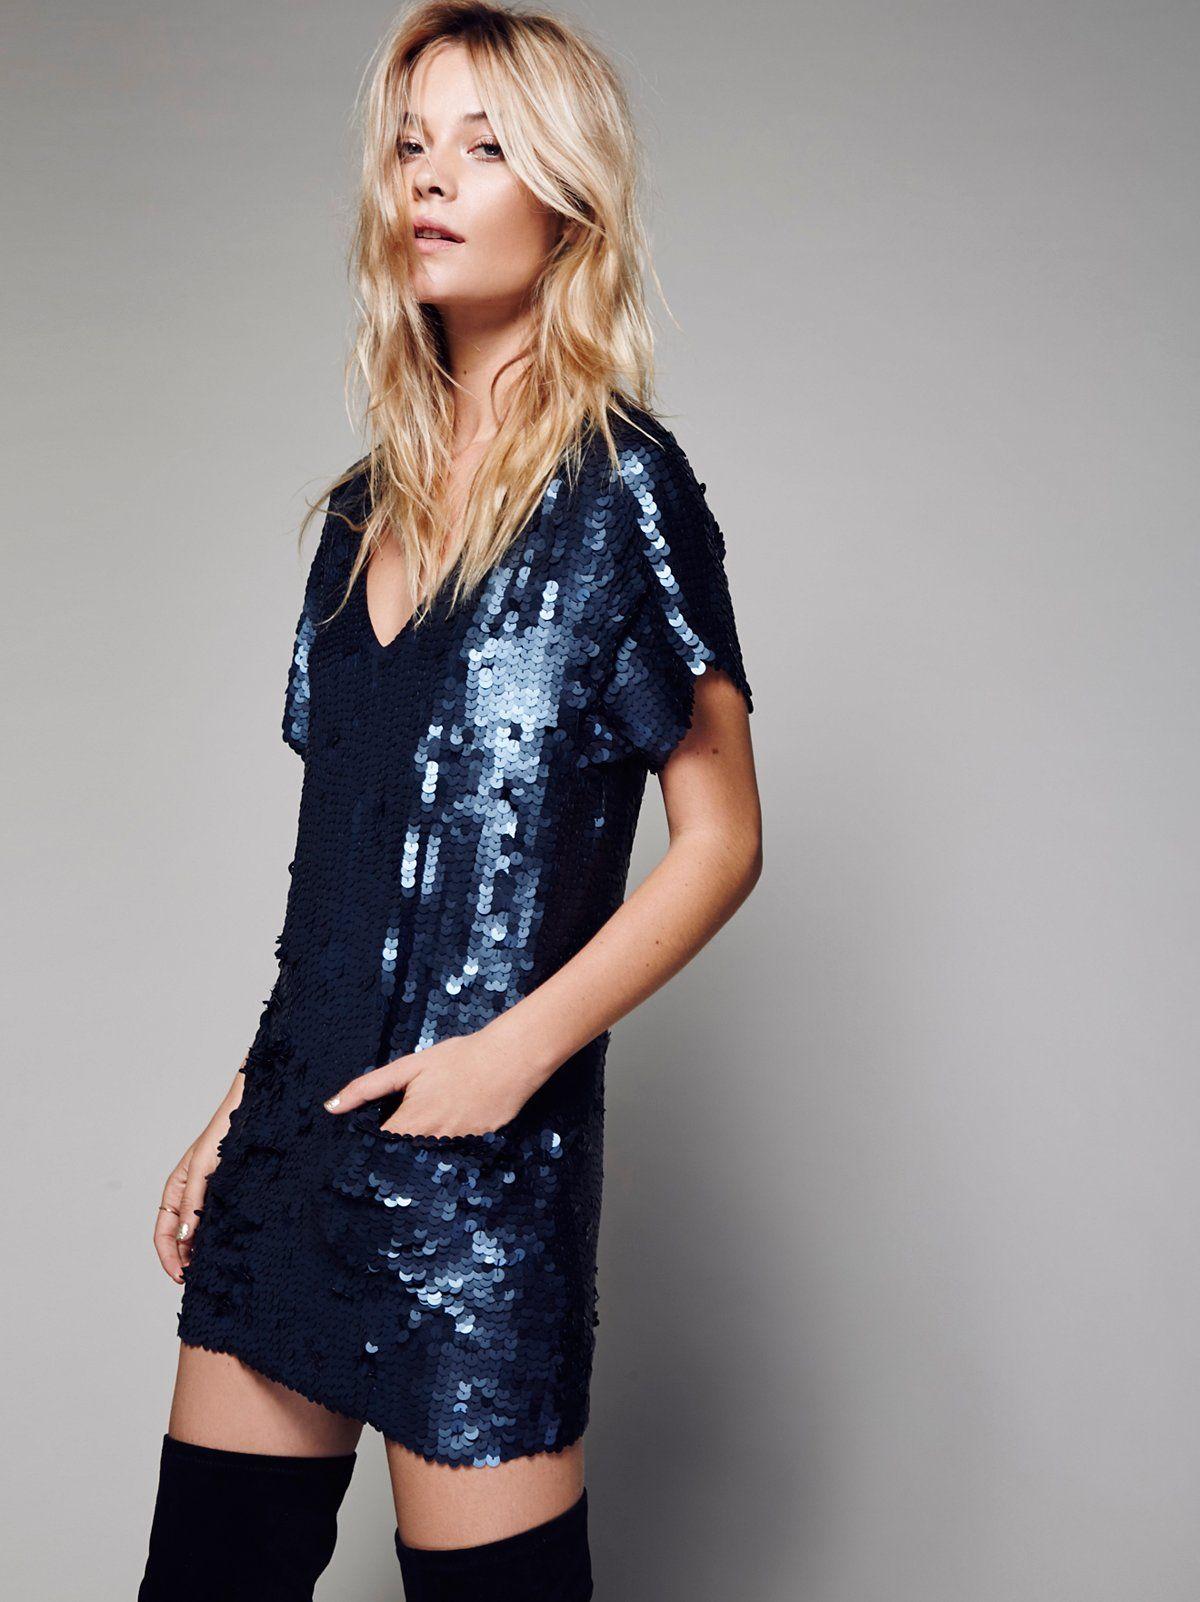 Sequin Casual Dresses